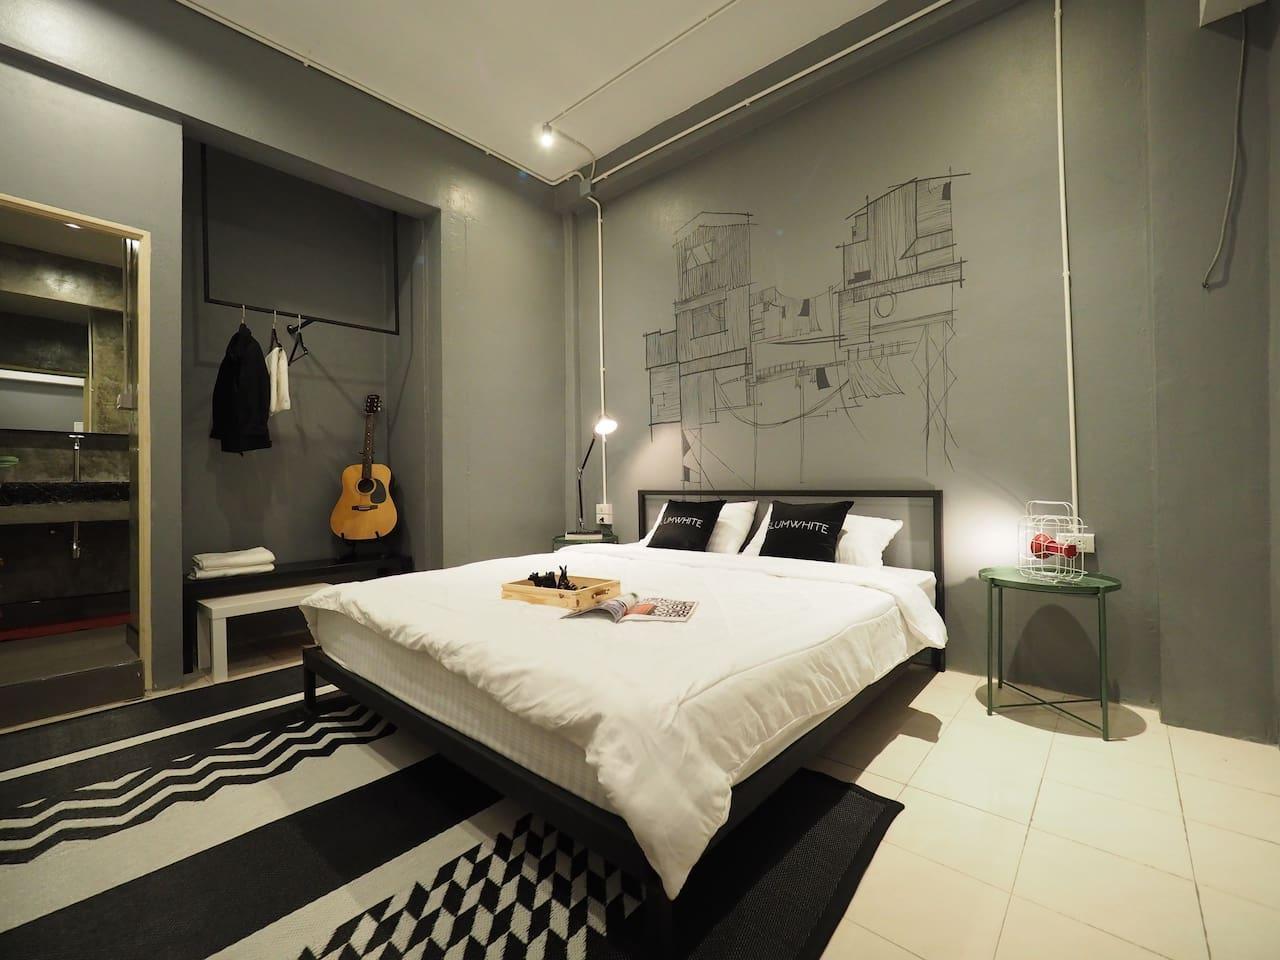 Private room for 2/JJ market/BTS/Aree อพาร์ตเมนต์ 1 ห้องนอน 1 ห้องน้ำส่วนตัว ขนาด 20 ตร.ม. – จตุจักร